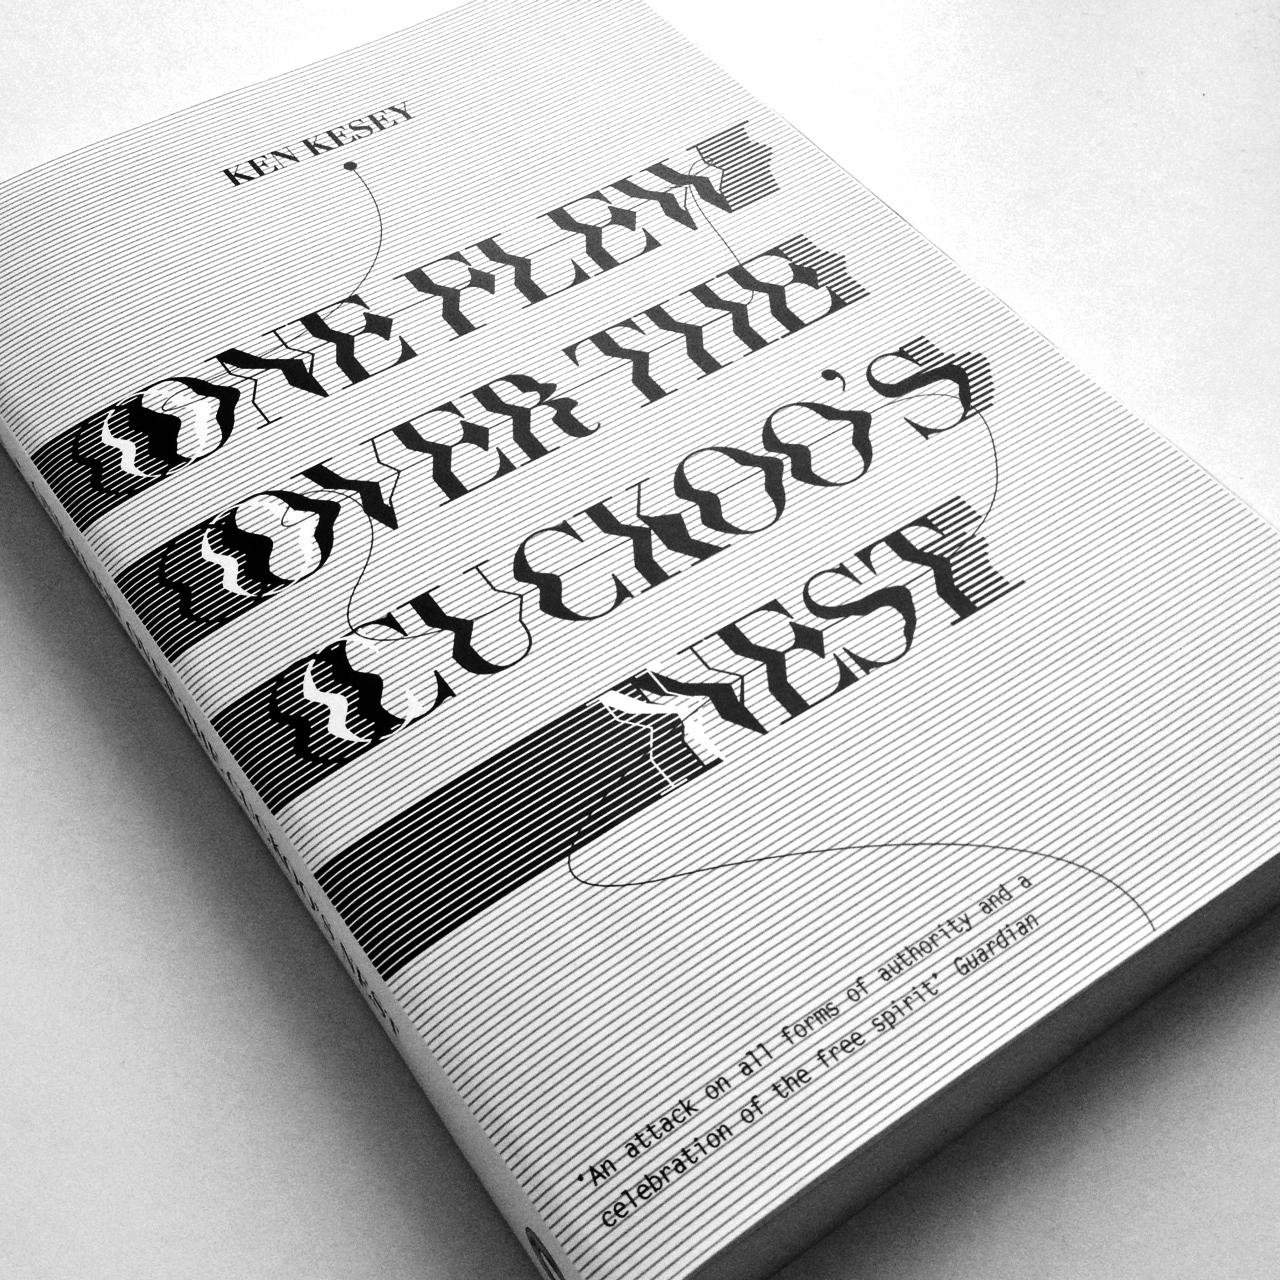 penguin_coverbook.jpg